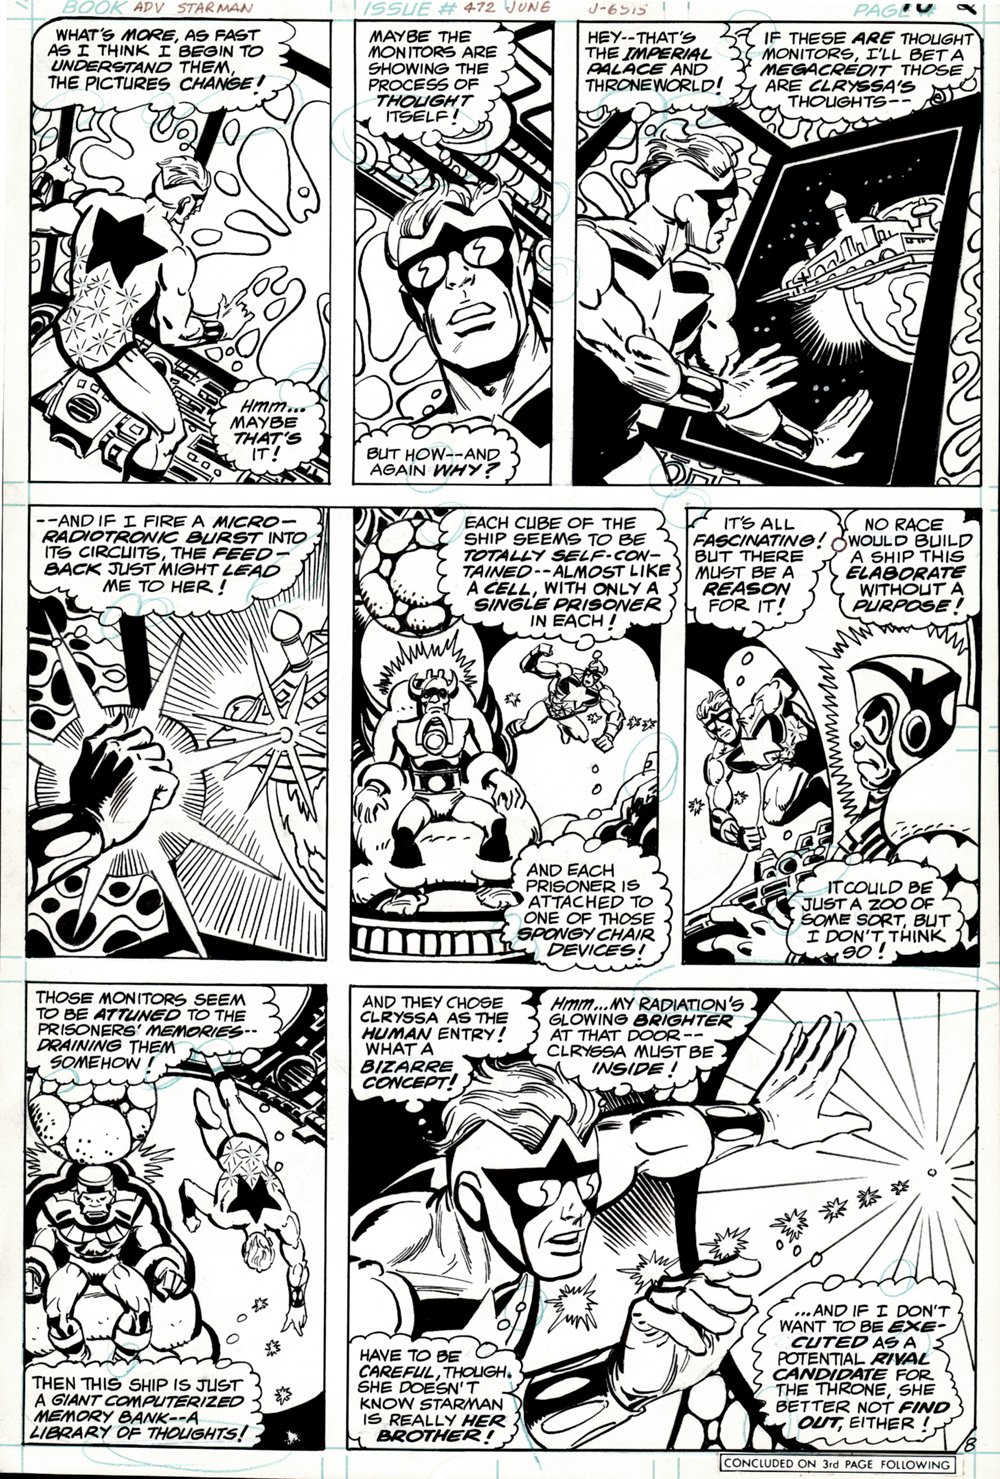 Adventure Comics #472 p 8 (STEVE DITKO BRONZE AGE 'STARMAN' BATTLES IN EVERY PANEL! 1980